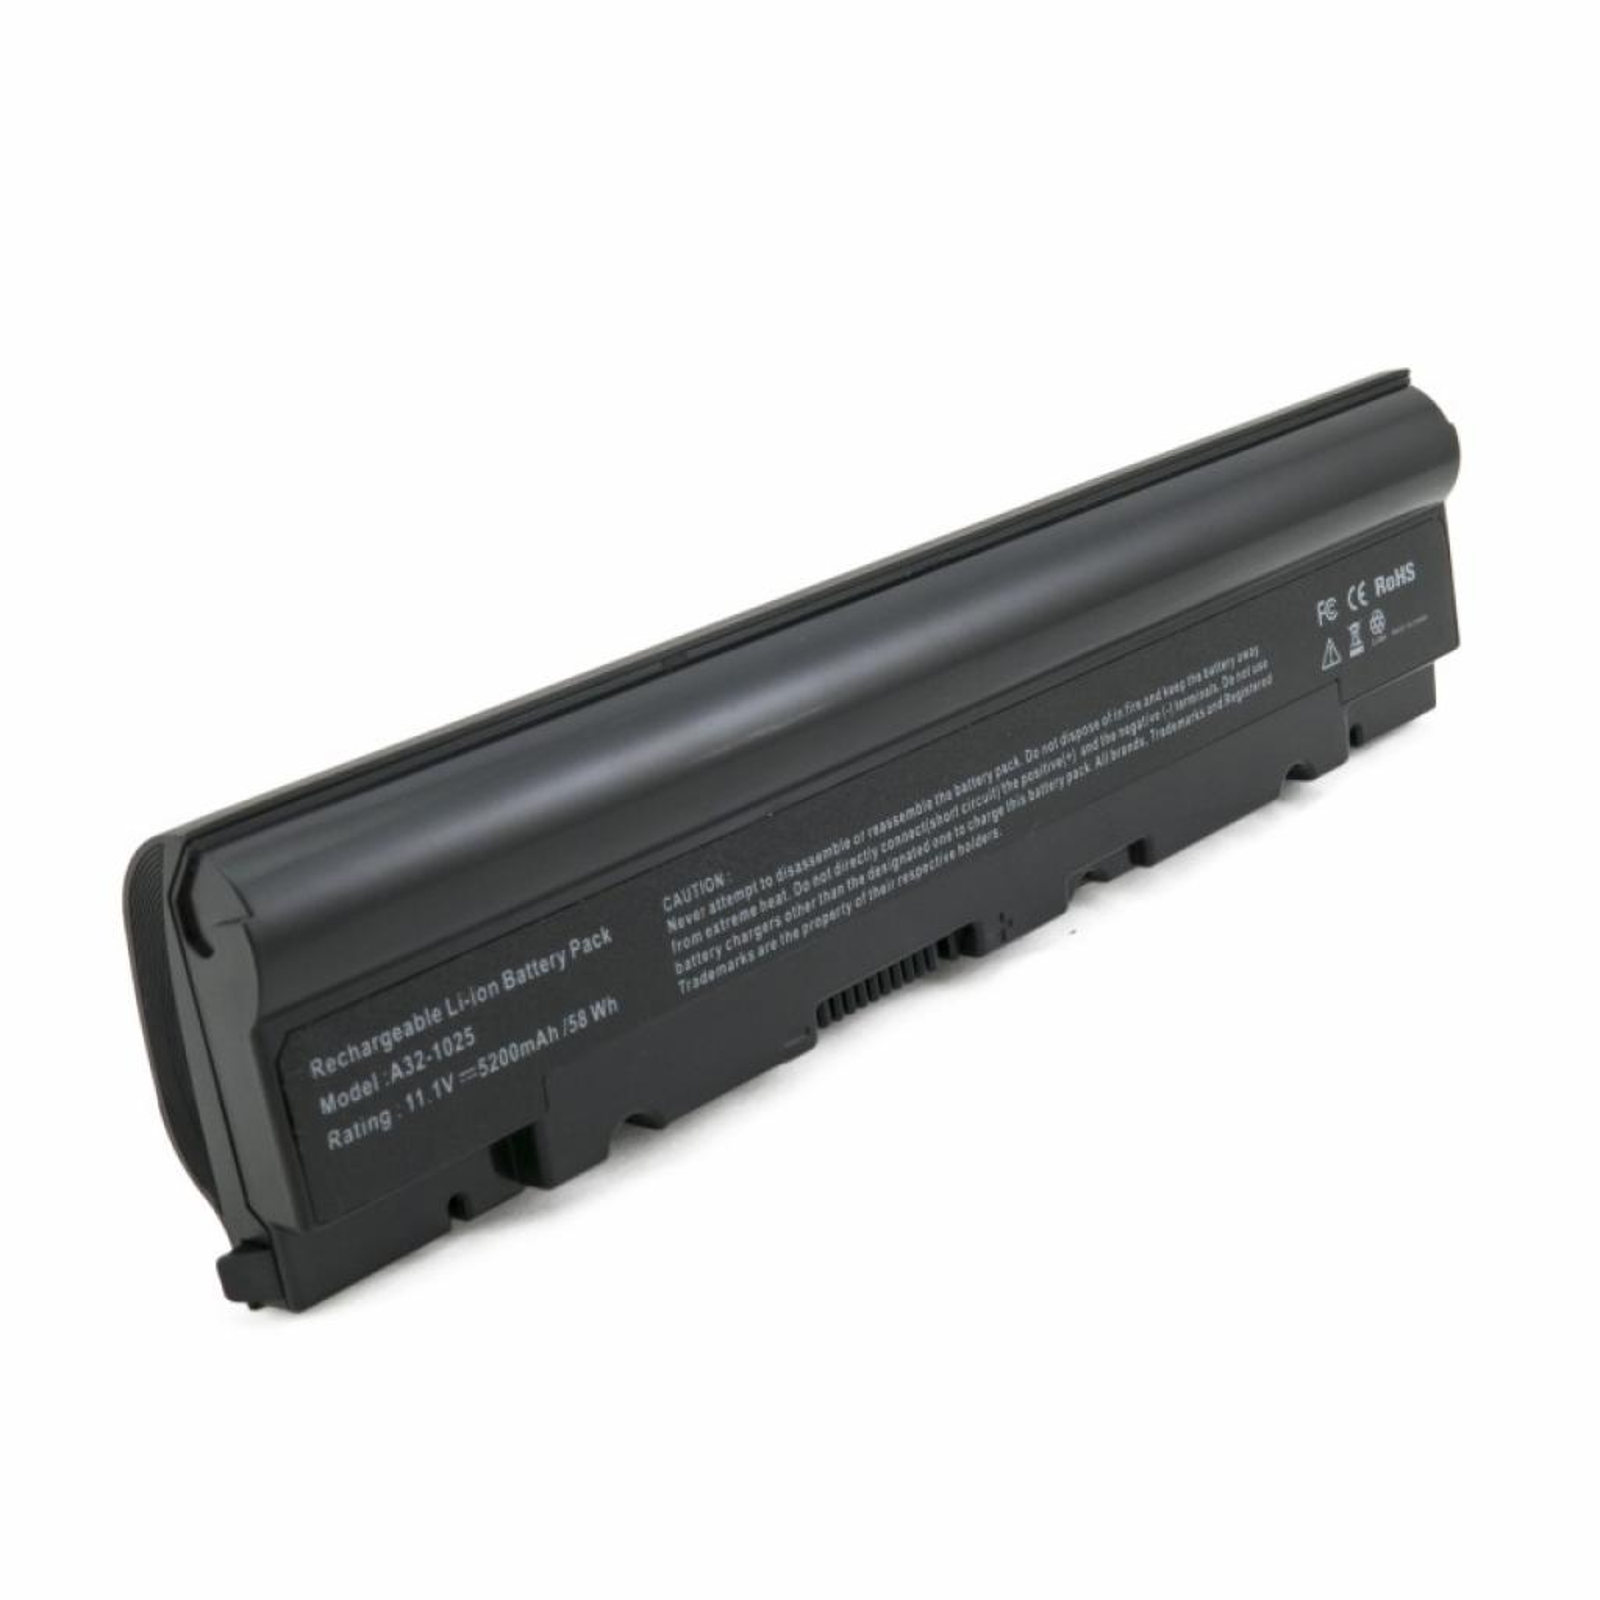 Аккумулятор для ноутбука Asus Eee PC 1025 (A32-1025) 5200 mAh Extradigital (BNA3921)